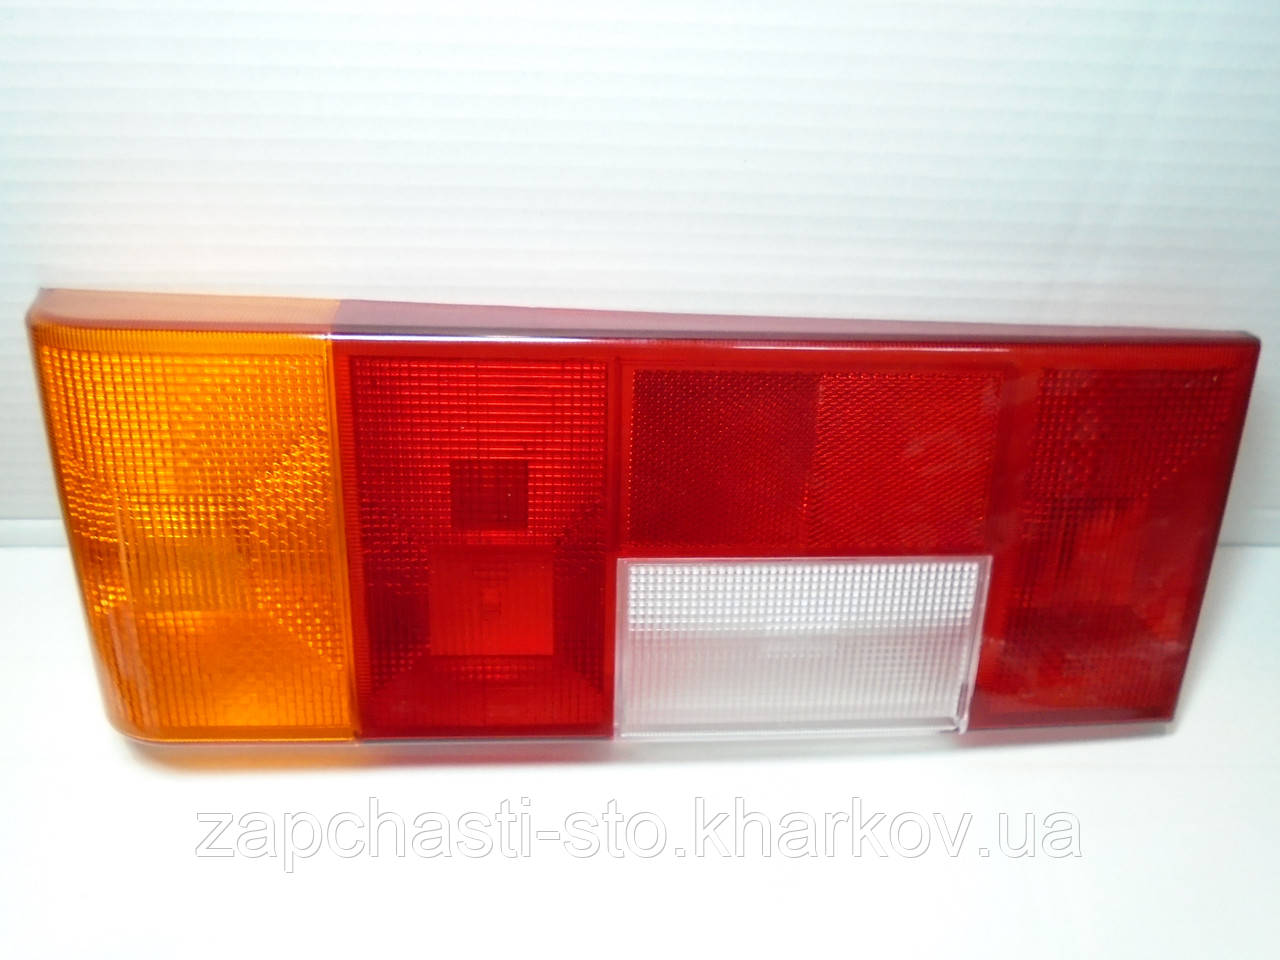 Стекло задней фары ВАЗ 2108, 2109, 21099 Самара левое